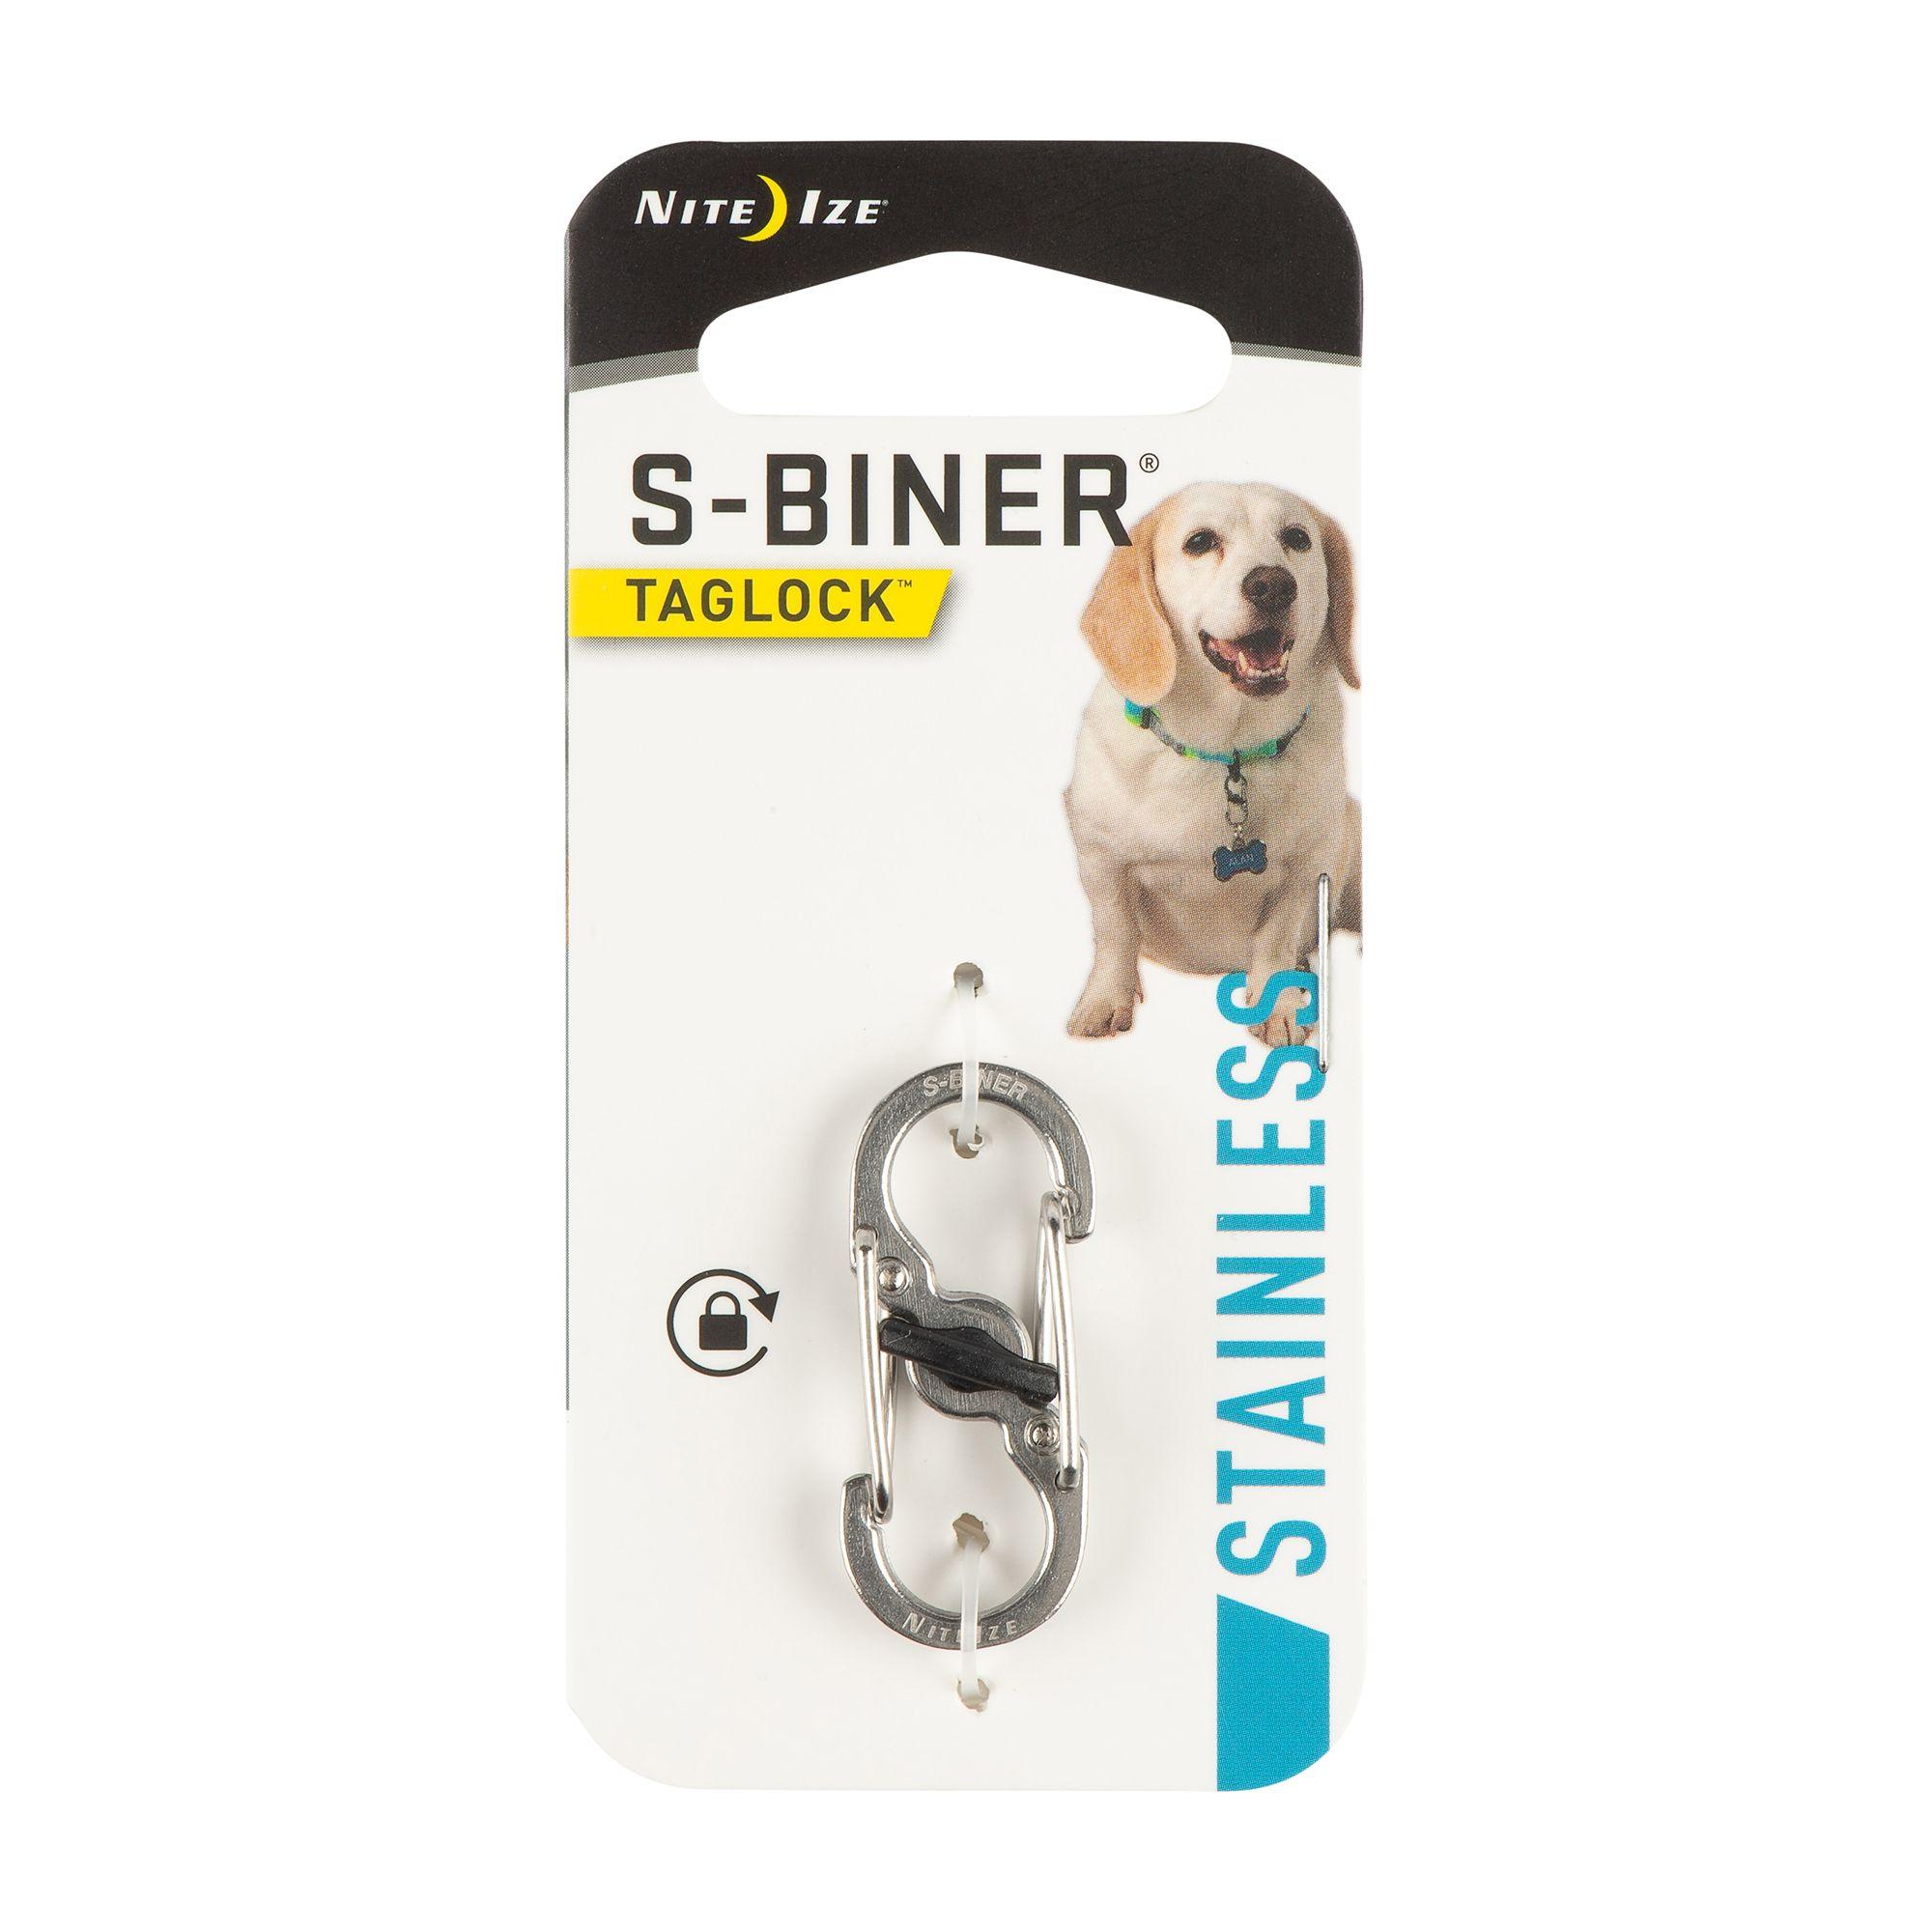 Nite Ize S Biner Stainless Steel Pet Taglock Trade Dog Id Tags Petsmart